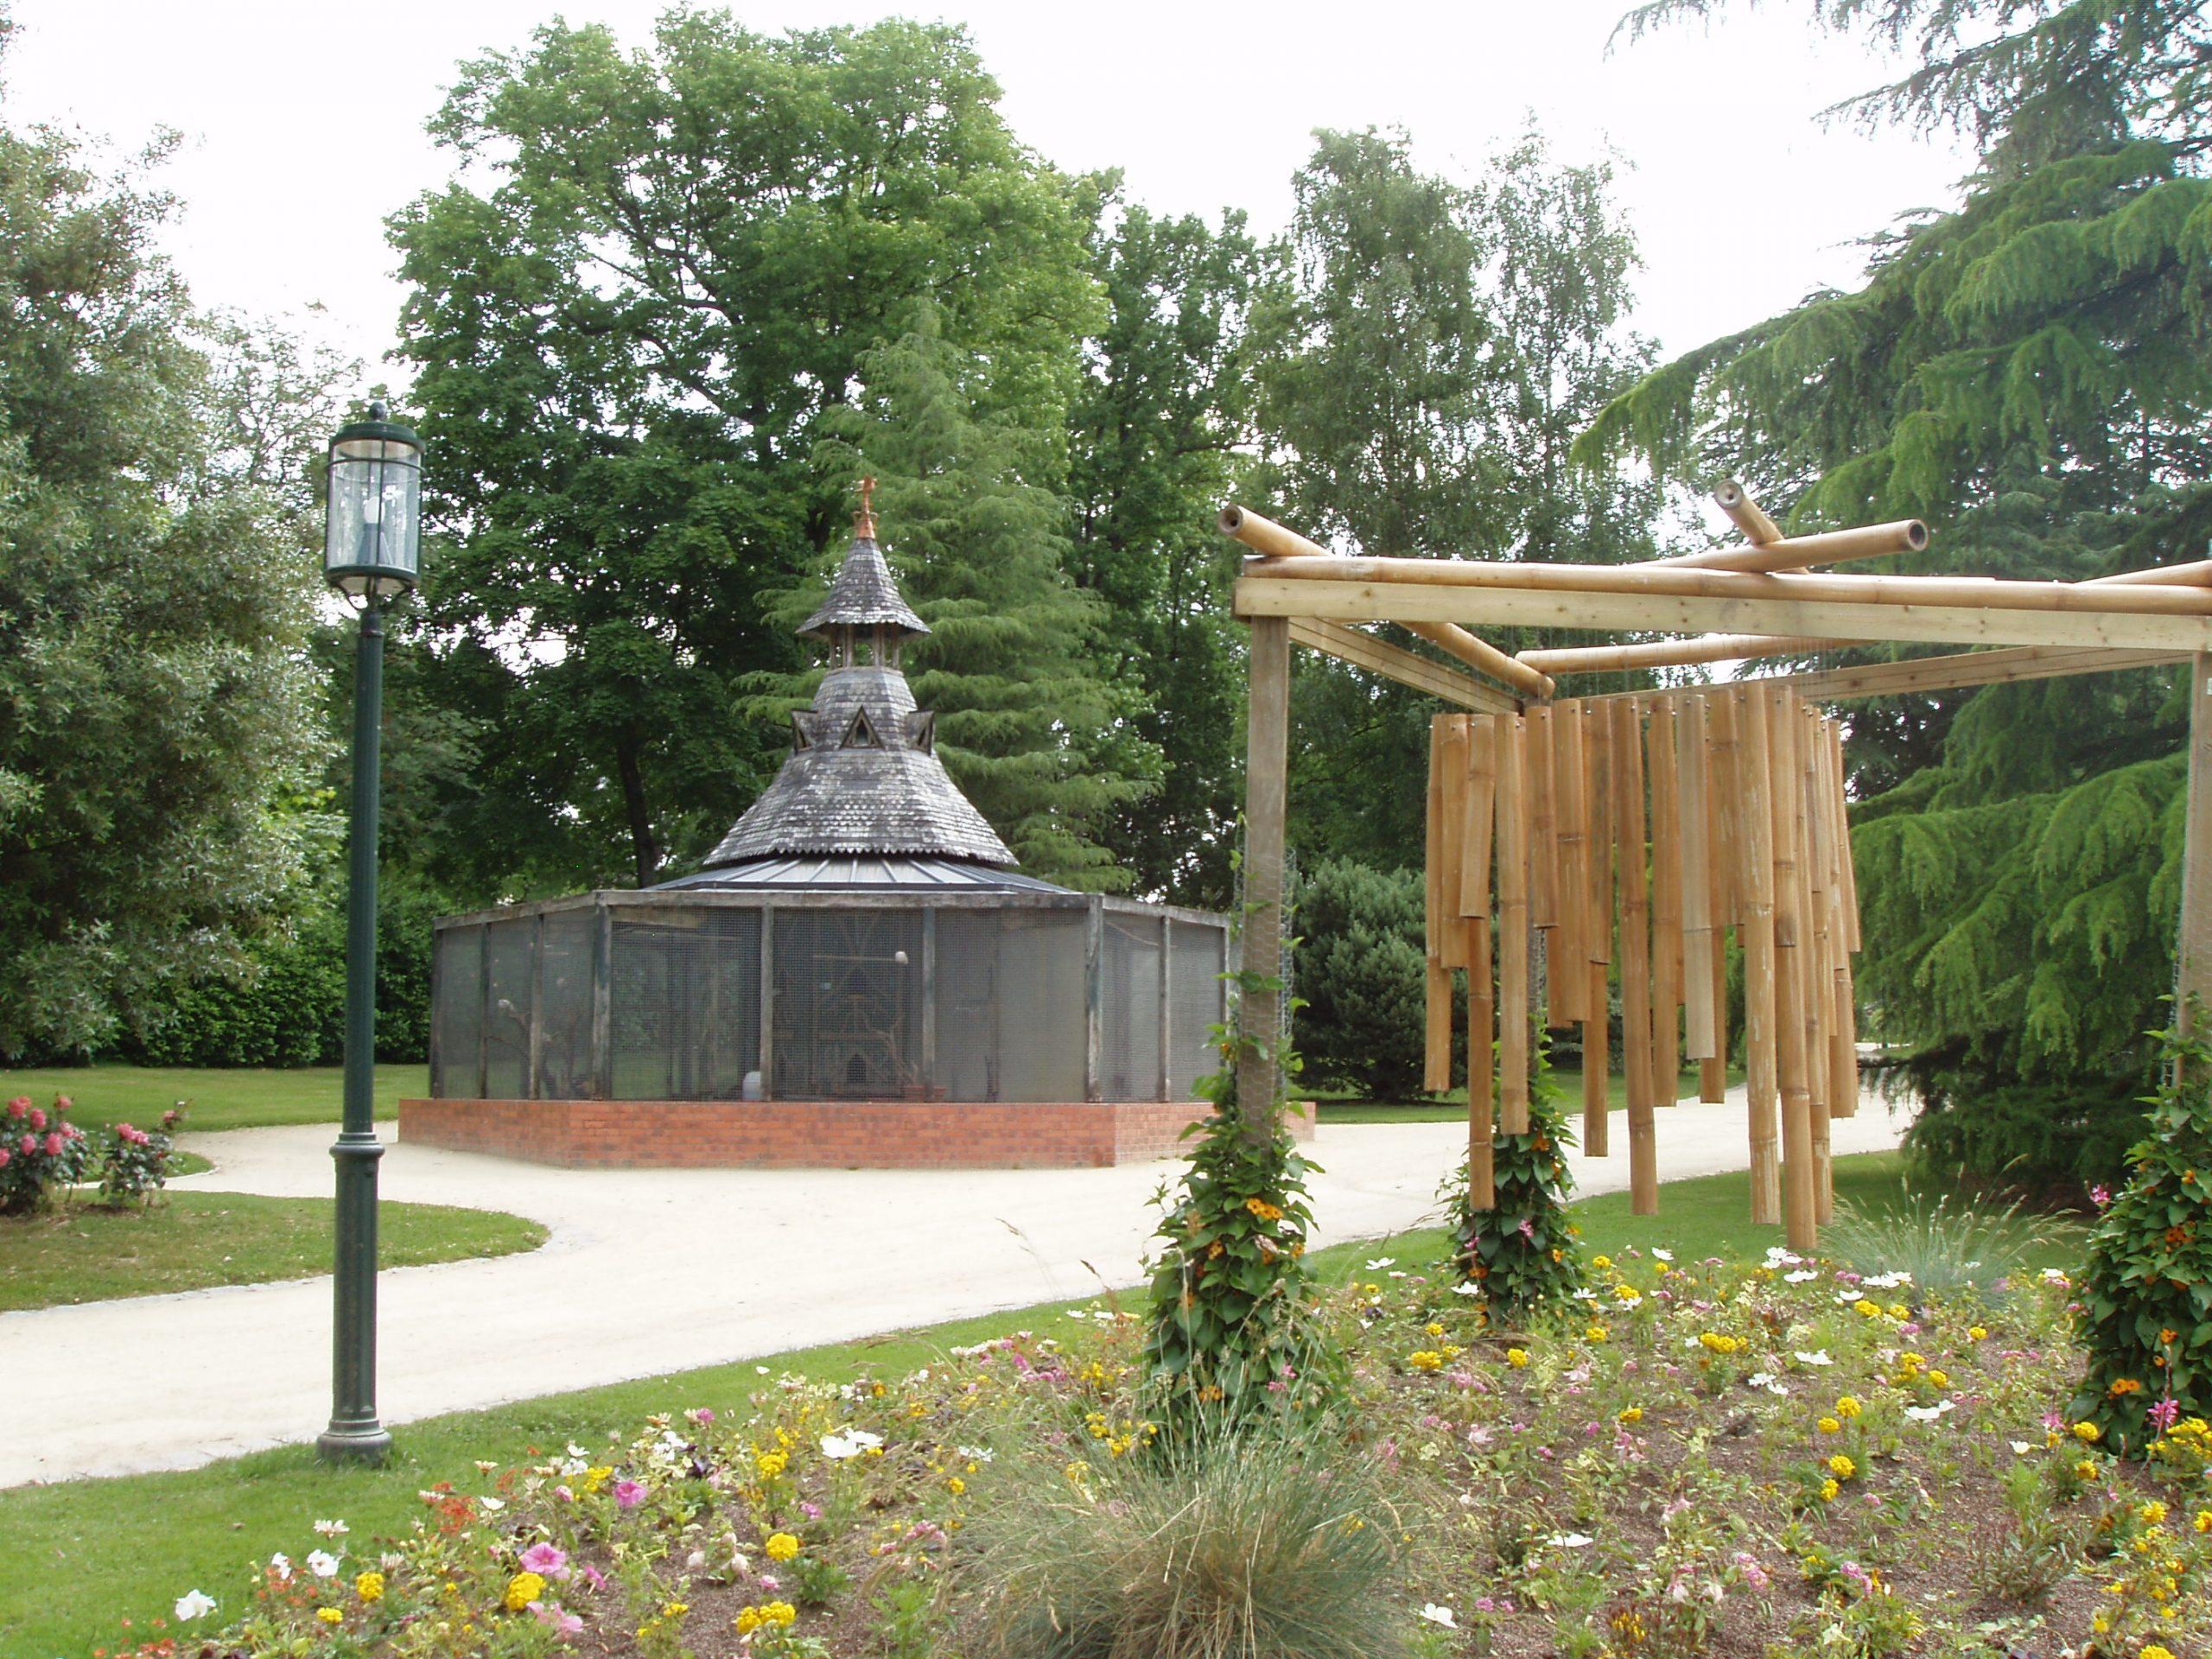 File:jardin Du Parc Volière.jpg - Wikimedia Commons destiné Voliere De Jardin